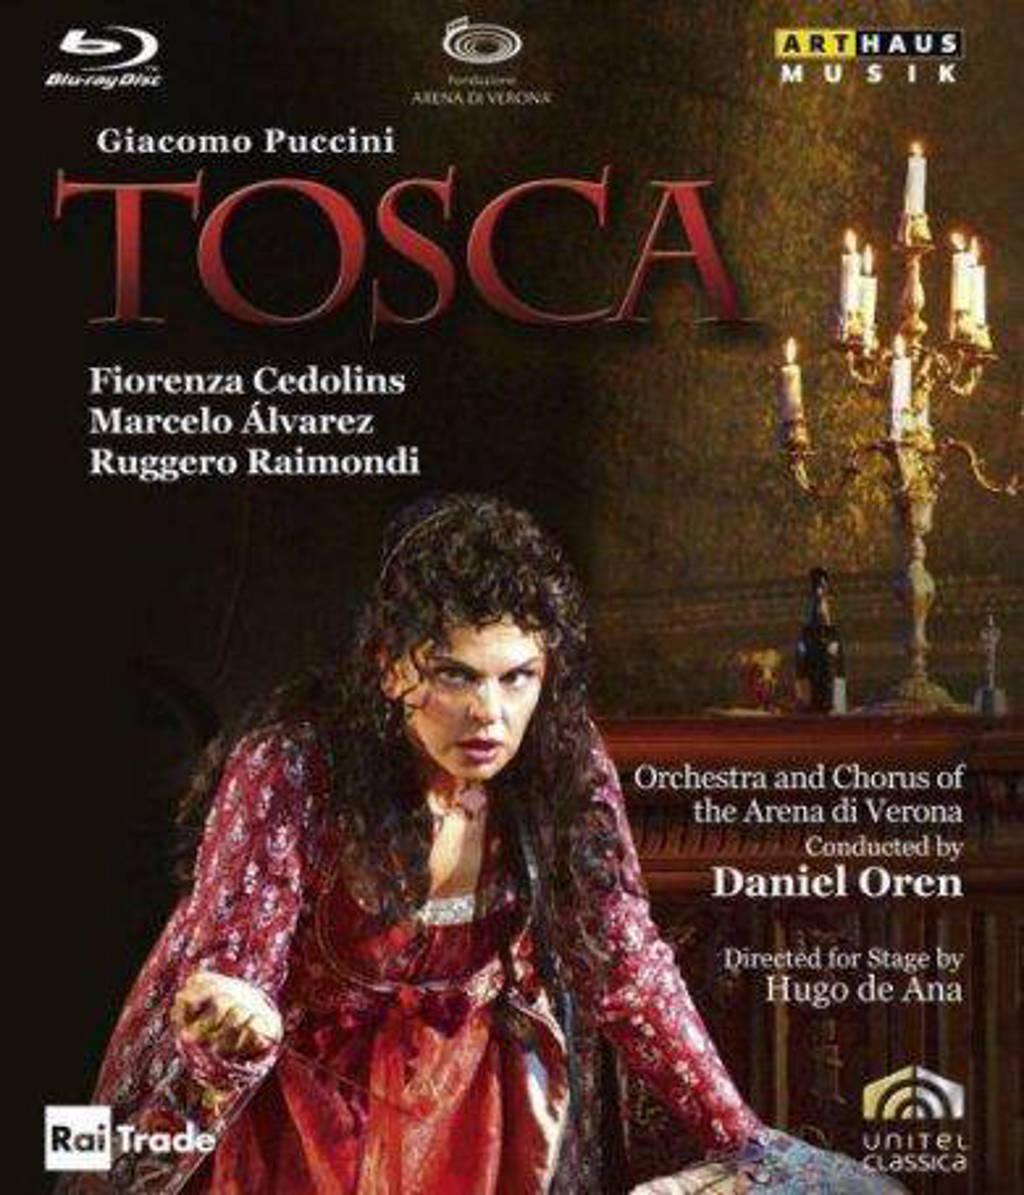 Marcelo Alvarez Fiorenza Cedolins - Tosca, Verona Blu-Ray Versie (Blu-ray)